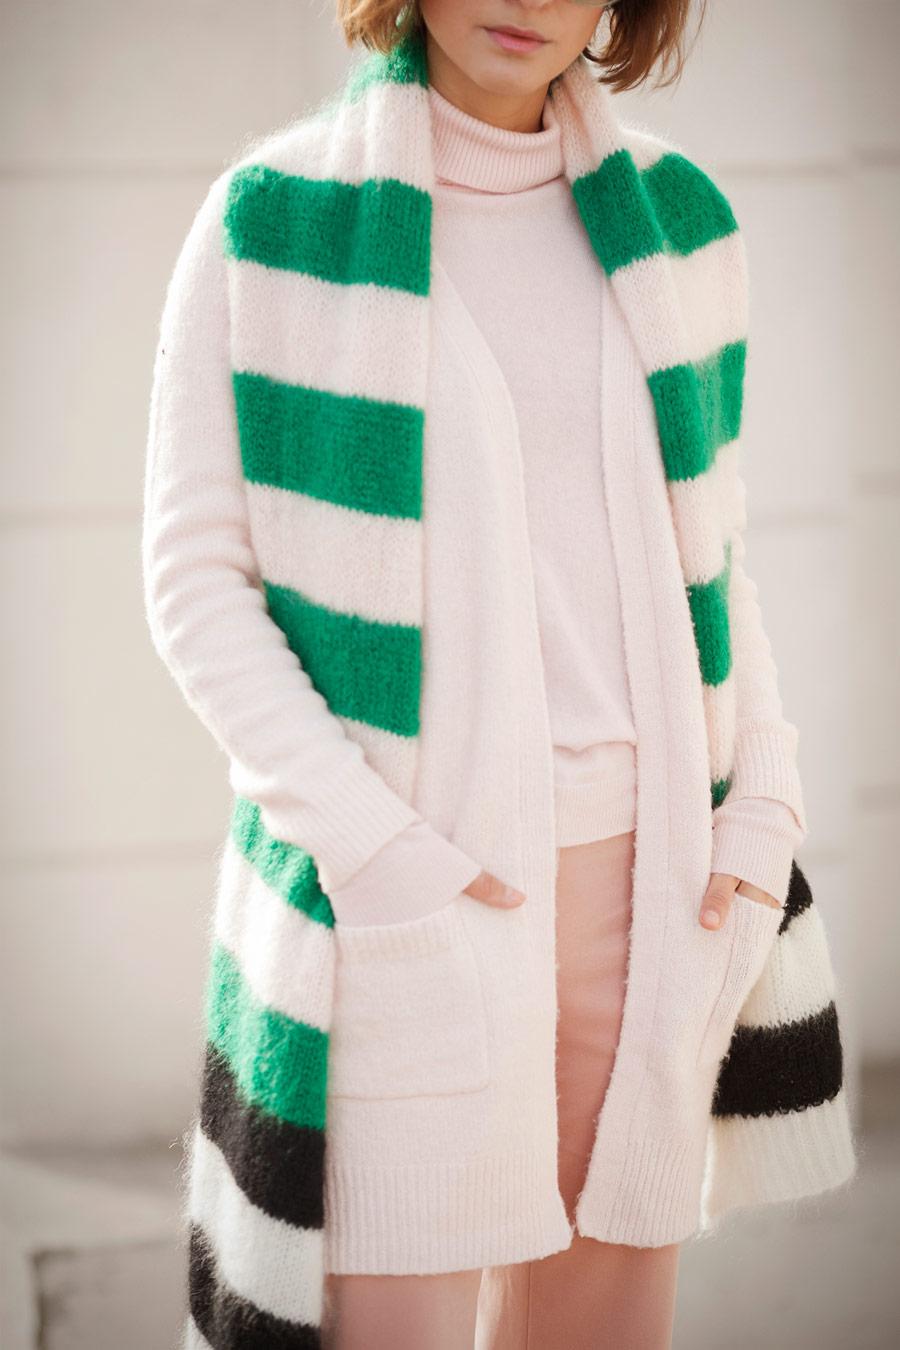 max mara scarf, micha lounge cardigan